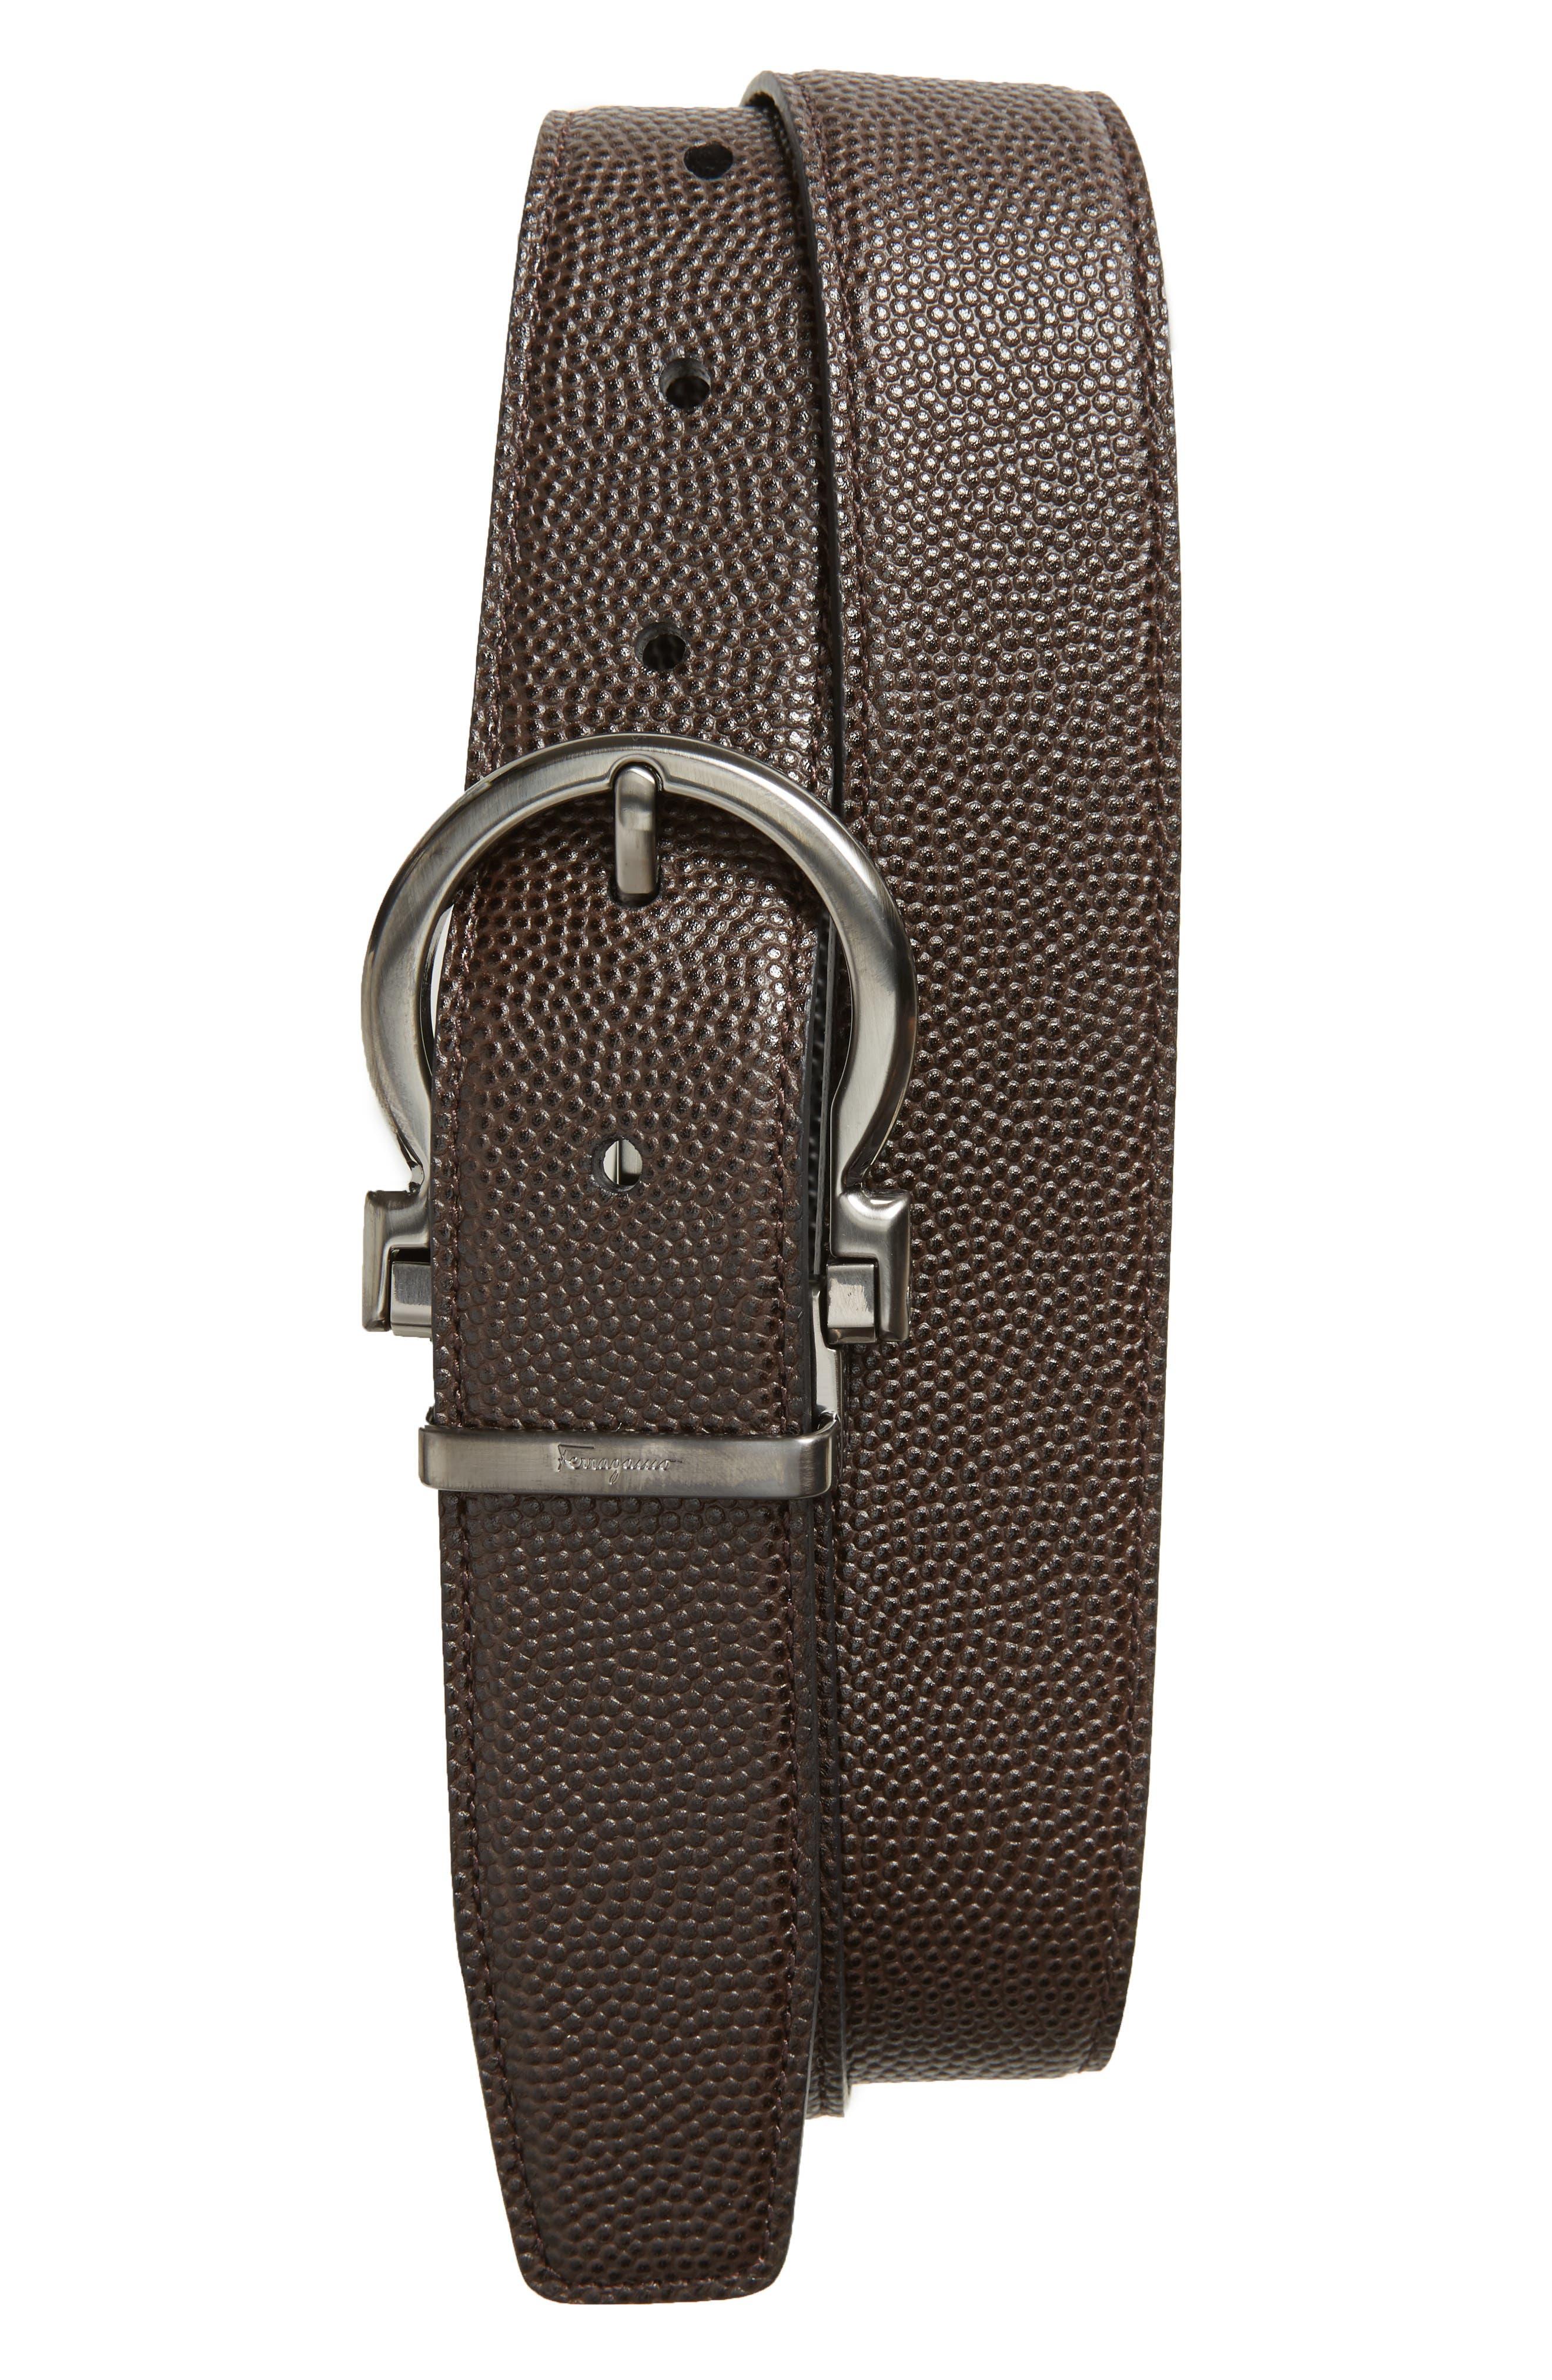 SALVATORE FERRAGAMO, Salvatore Ferragaom Reversible Leather Belt, Main thumbnail 1, color, CHOCOLATE/ BLACK